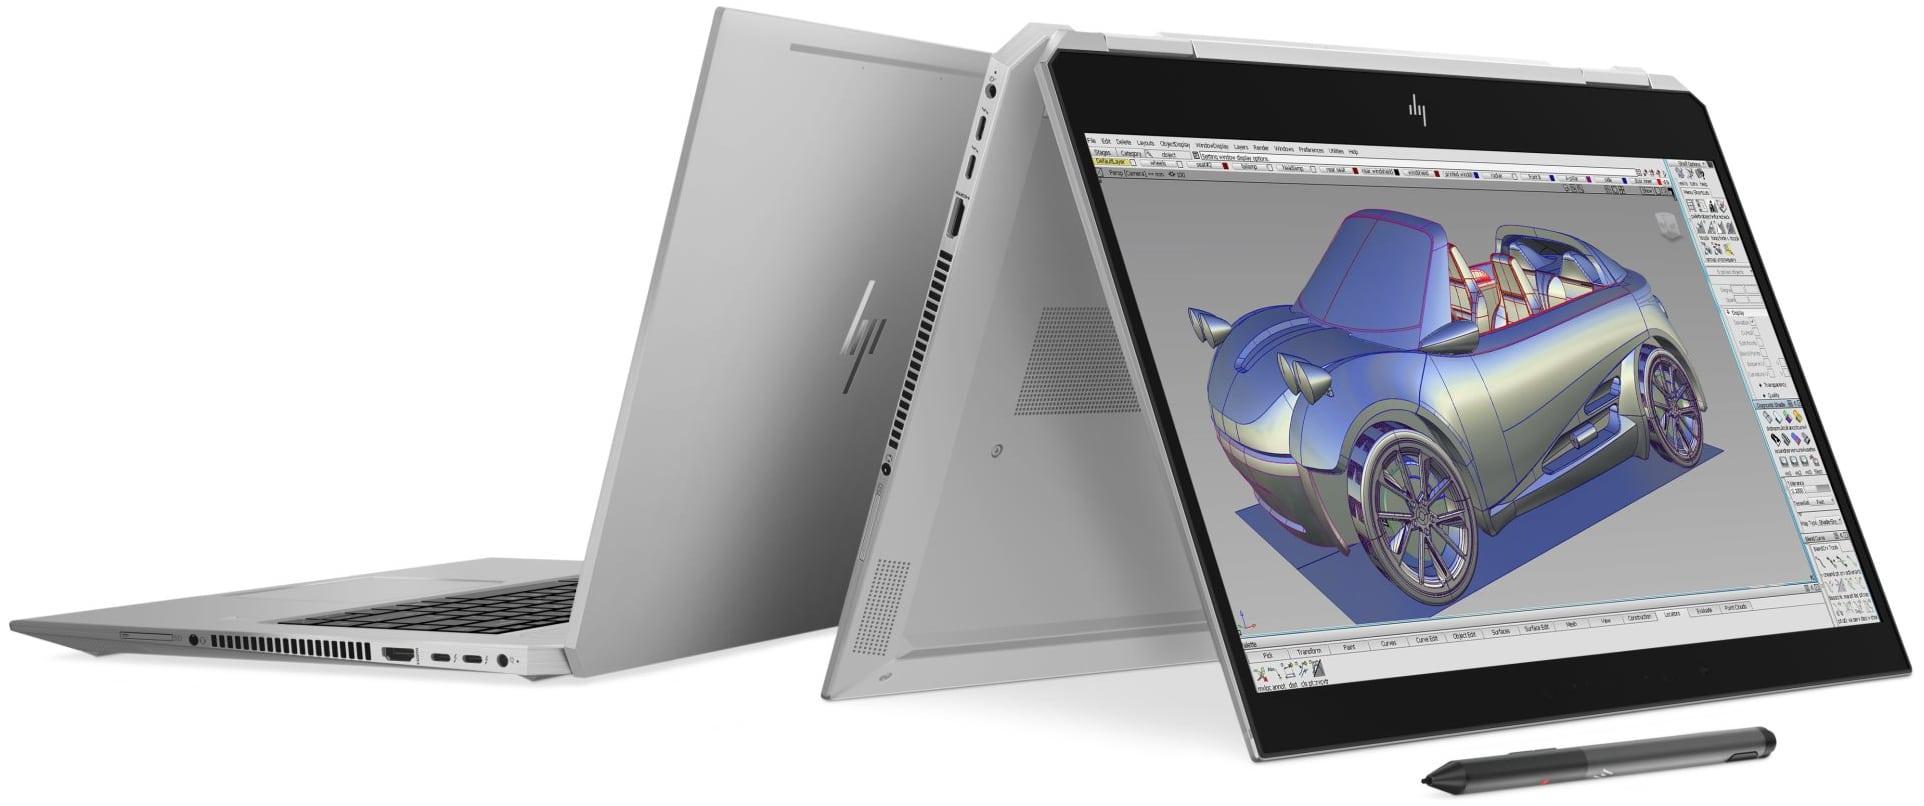 HP met à jour ses Ultrabooks Zbook avec Hexa Core i9 et Quadro P2000